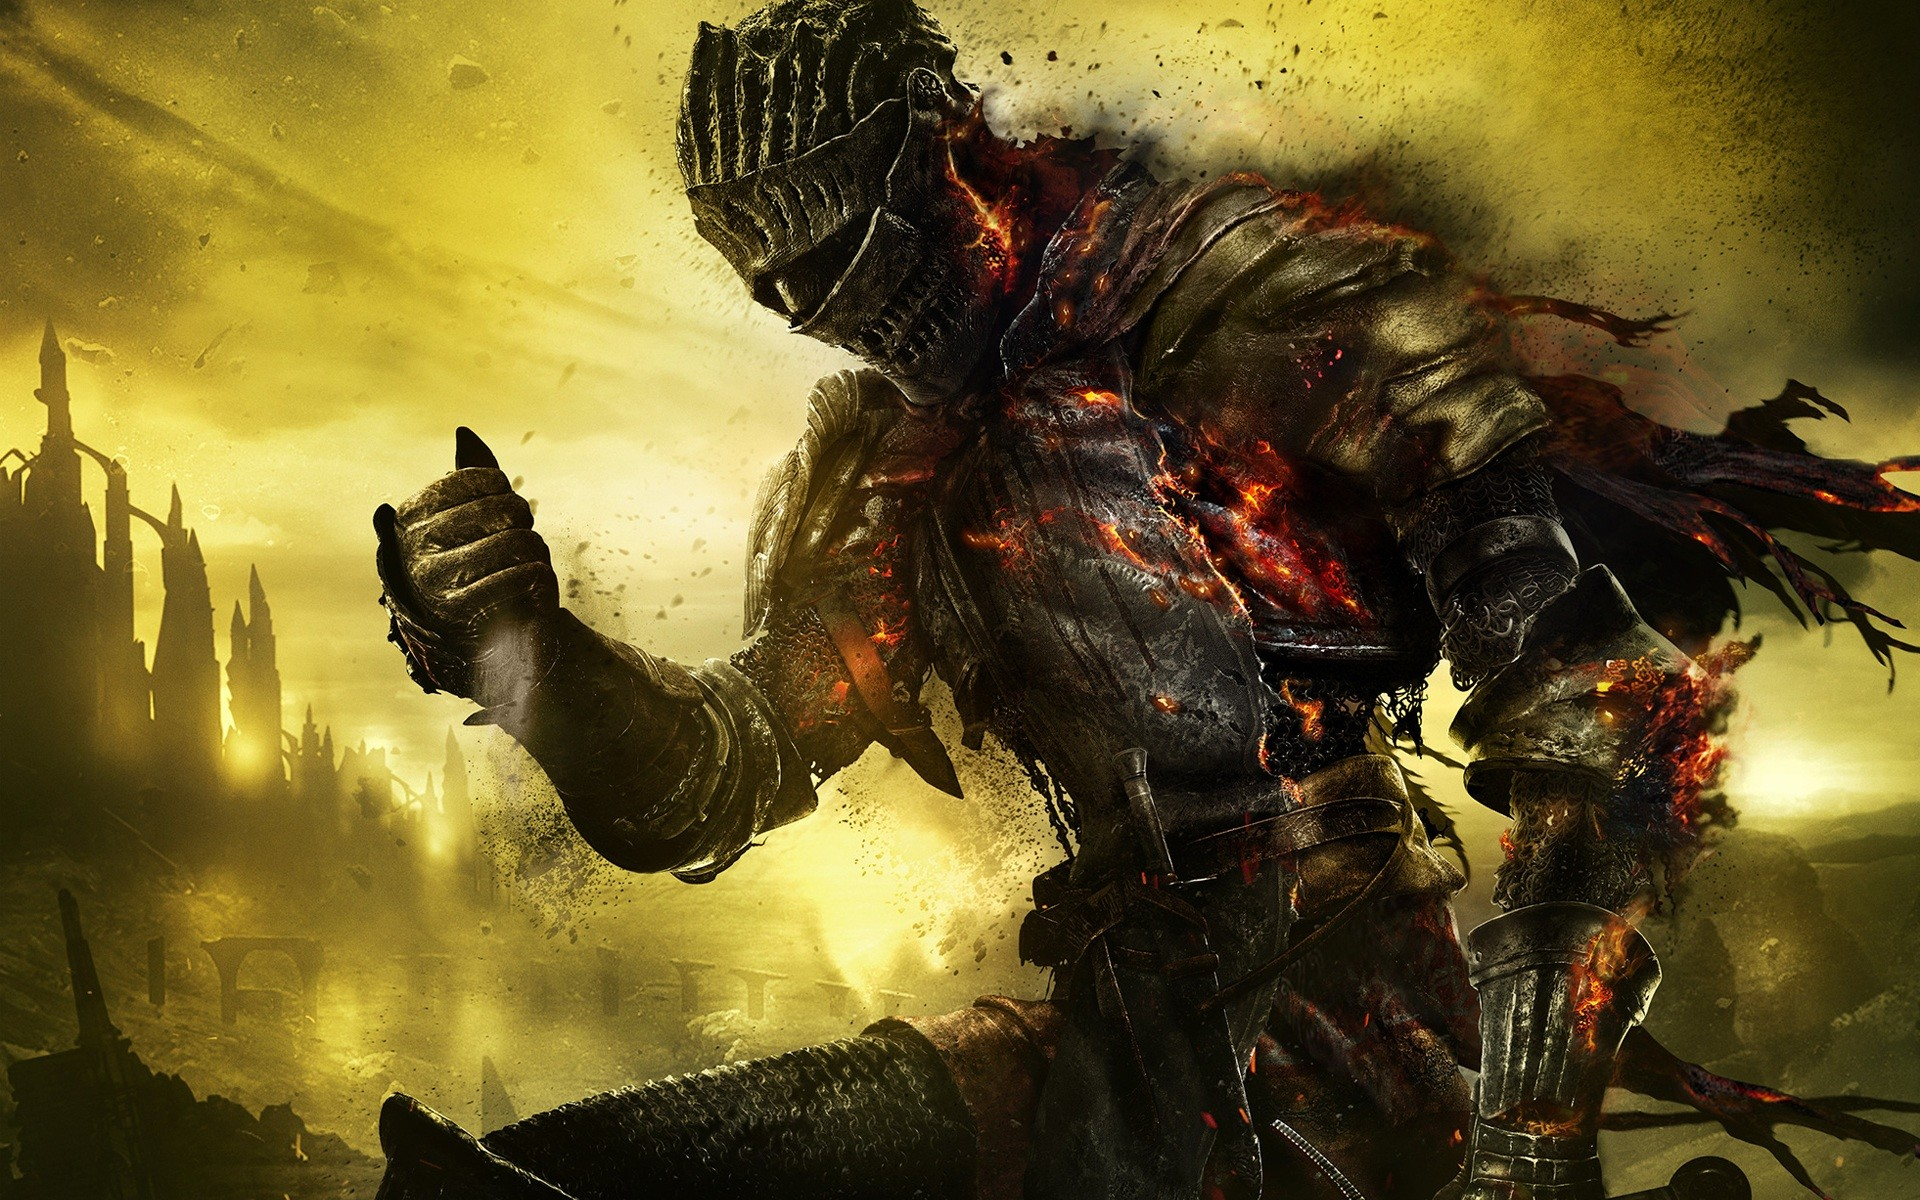 Dark Souls 3 Live Wallpaper (81+ images)